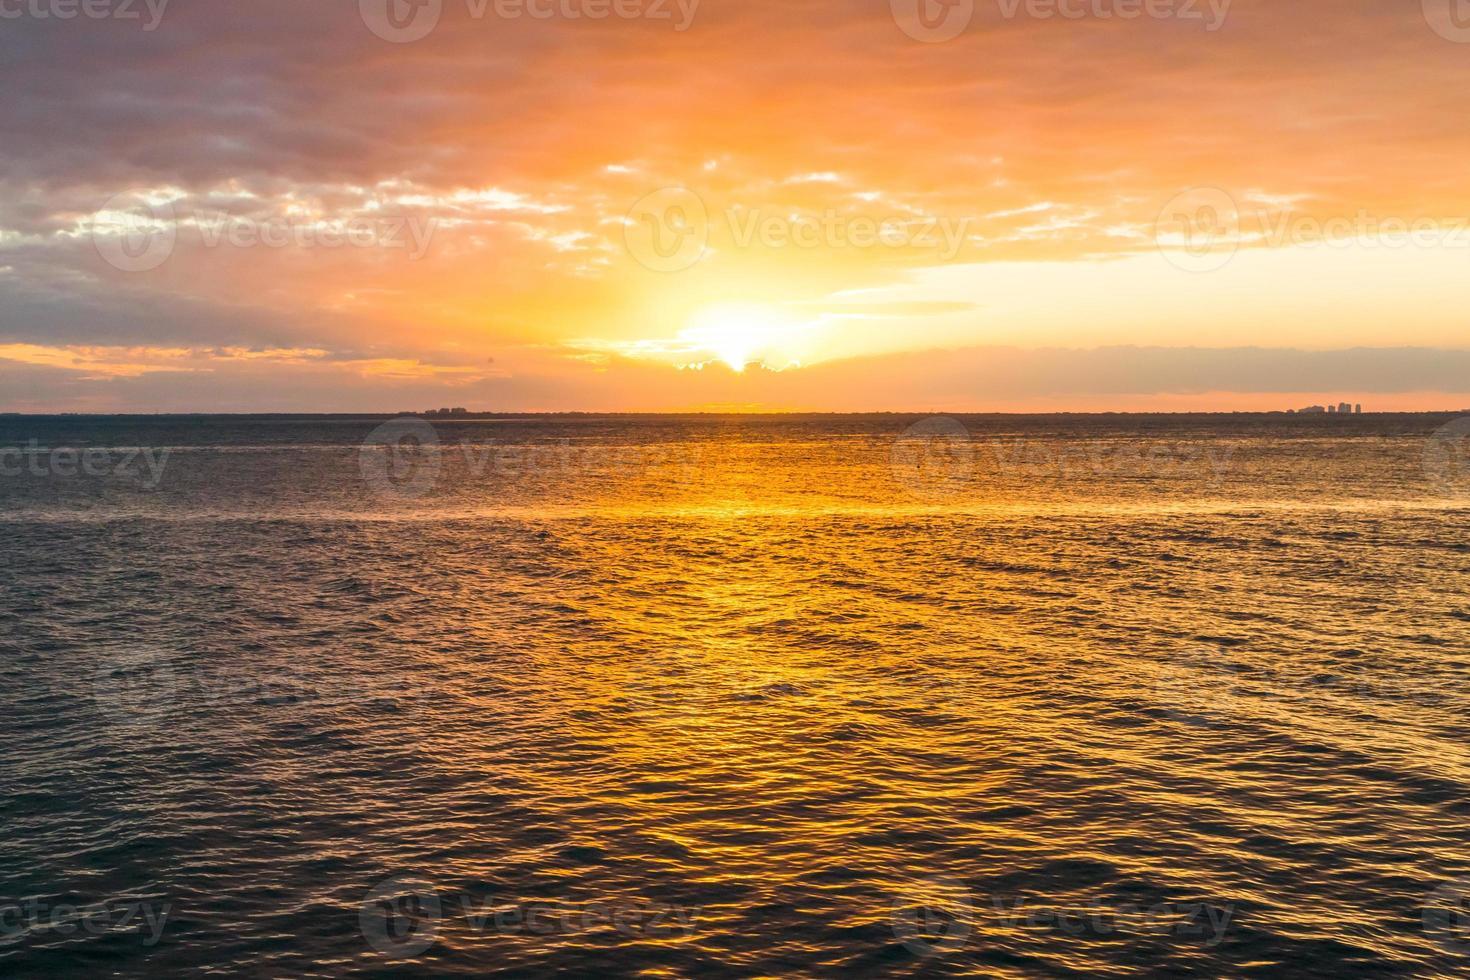 sunset in Miami Beach photo